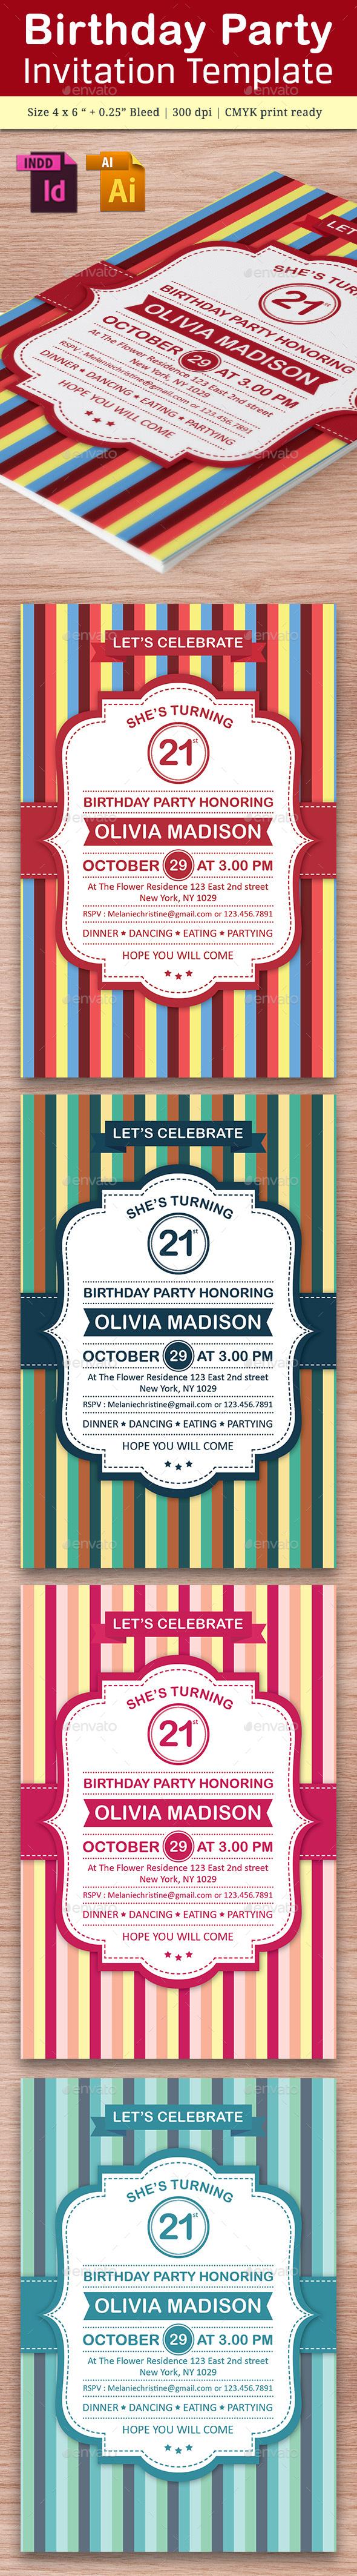 Birthday Party Invitation Template - Vol . 9 - Cards & Invites Print Templates